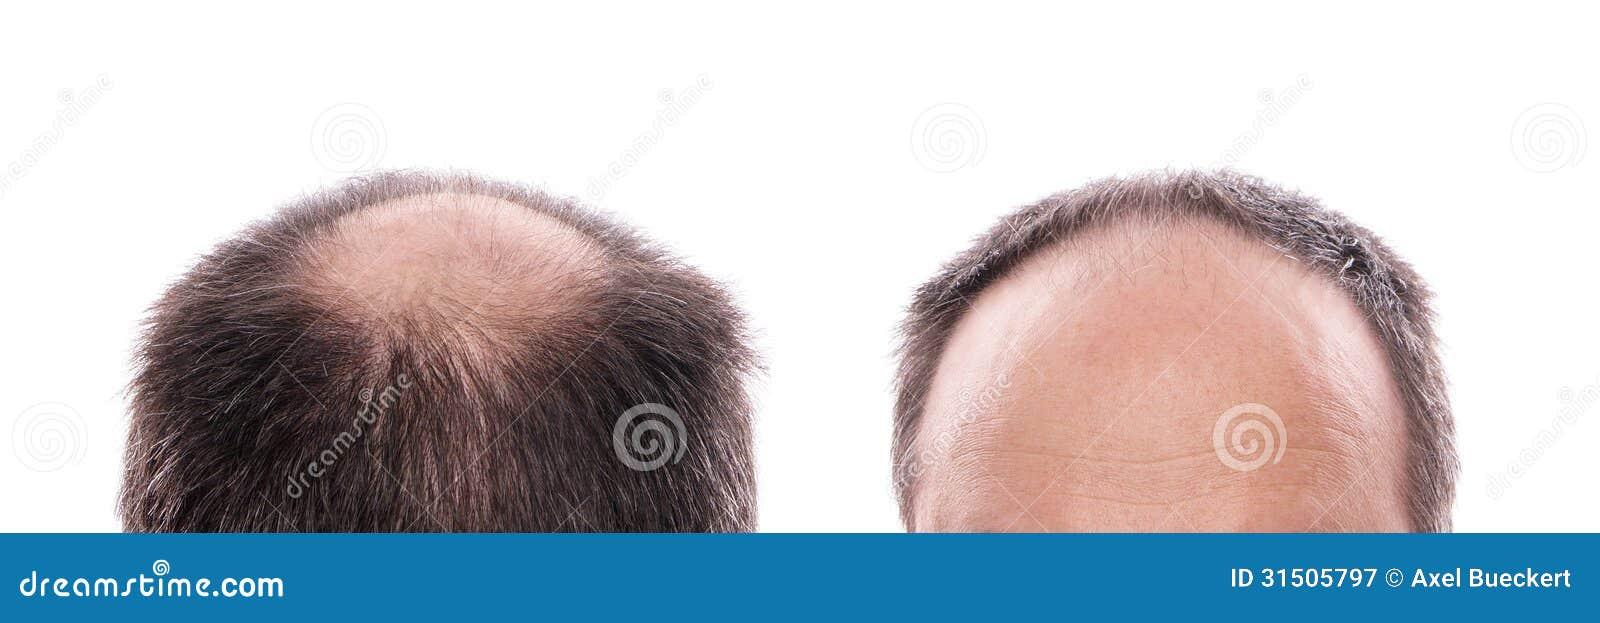 Hair Loss Stock Image Image Of Loss Receding Background 31505797